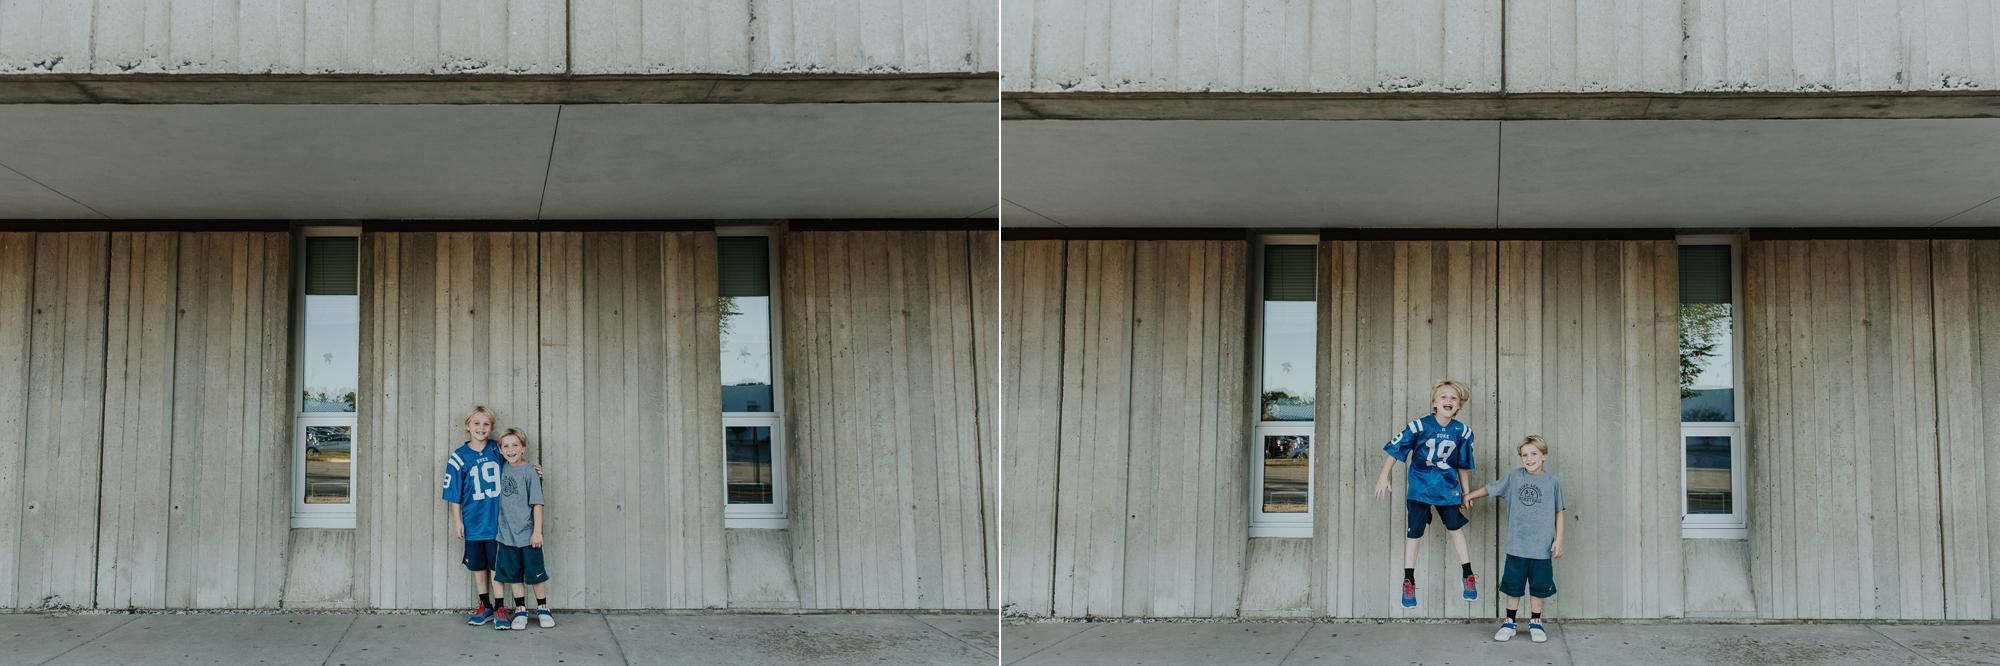 012-storyboard.jpg